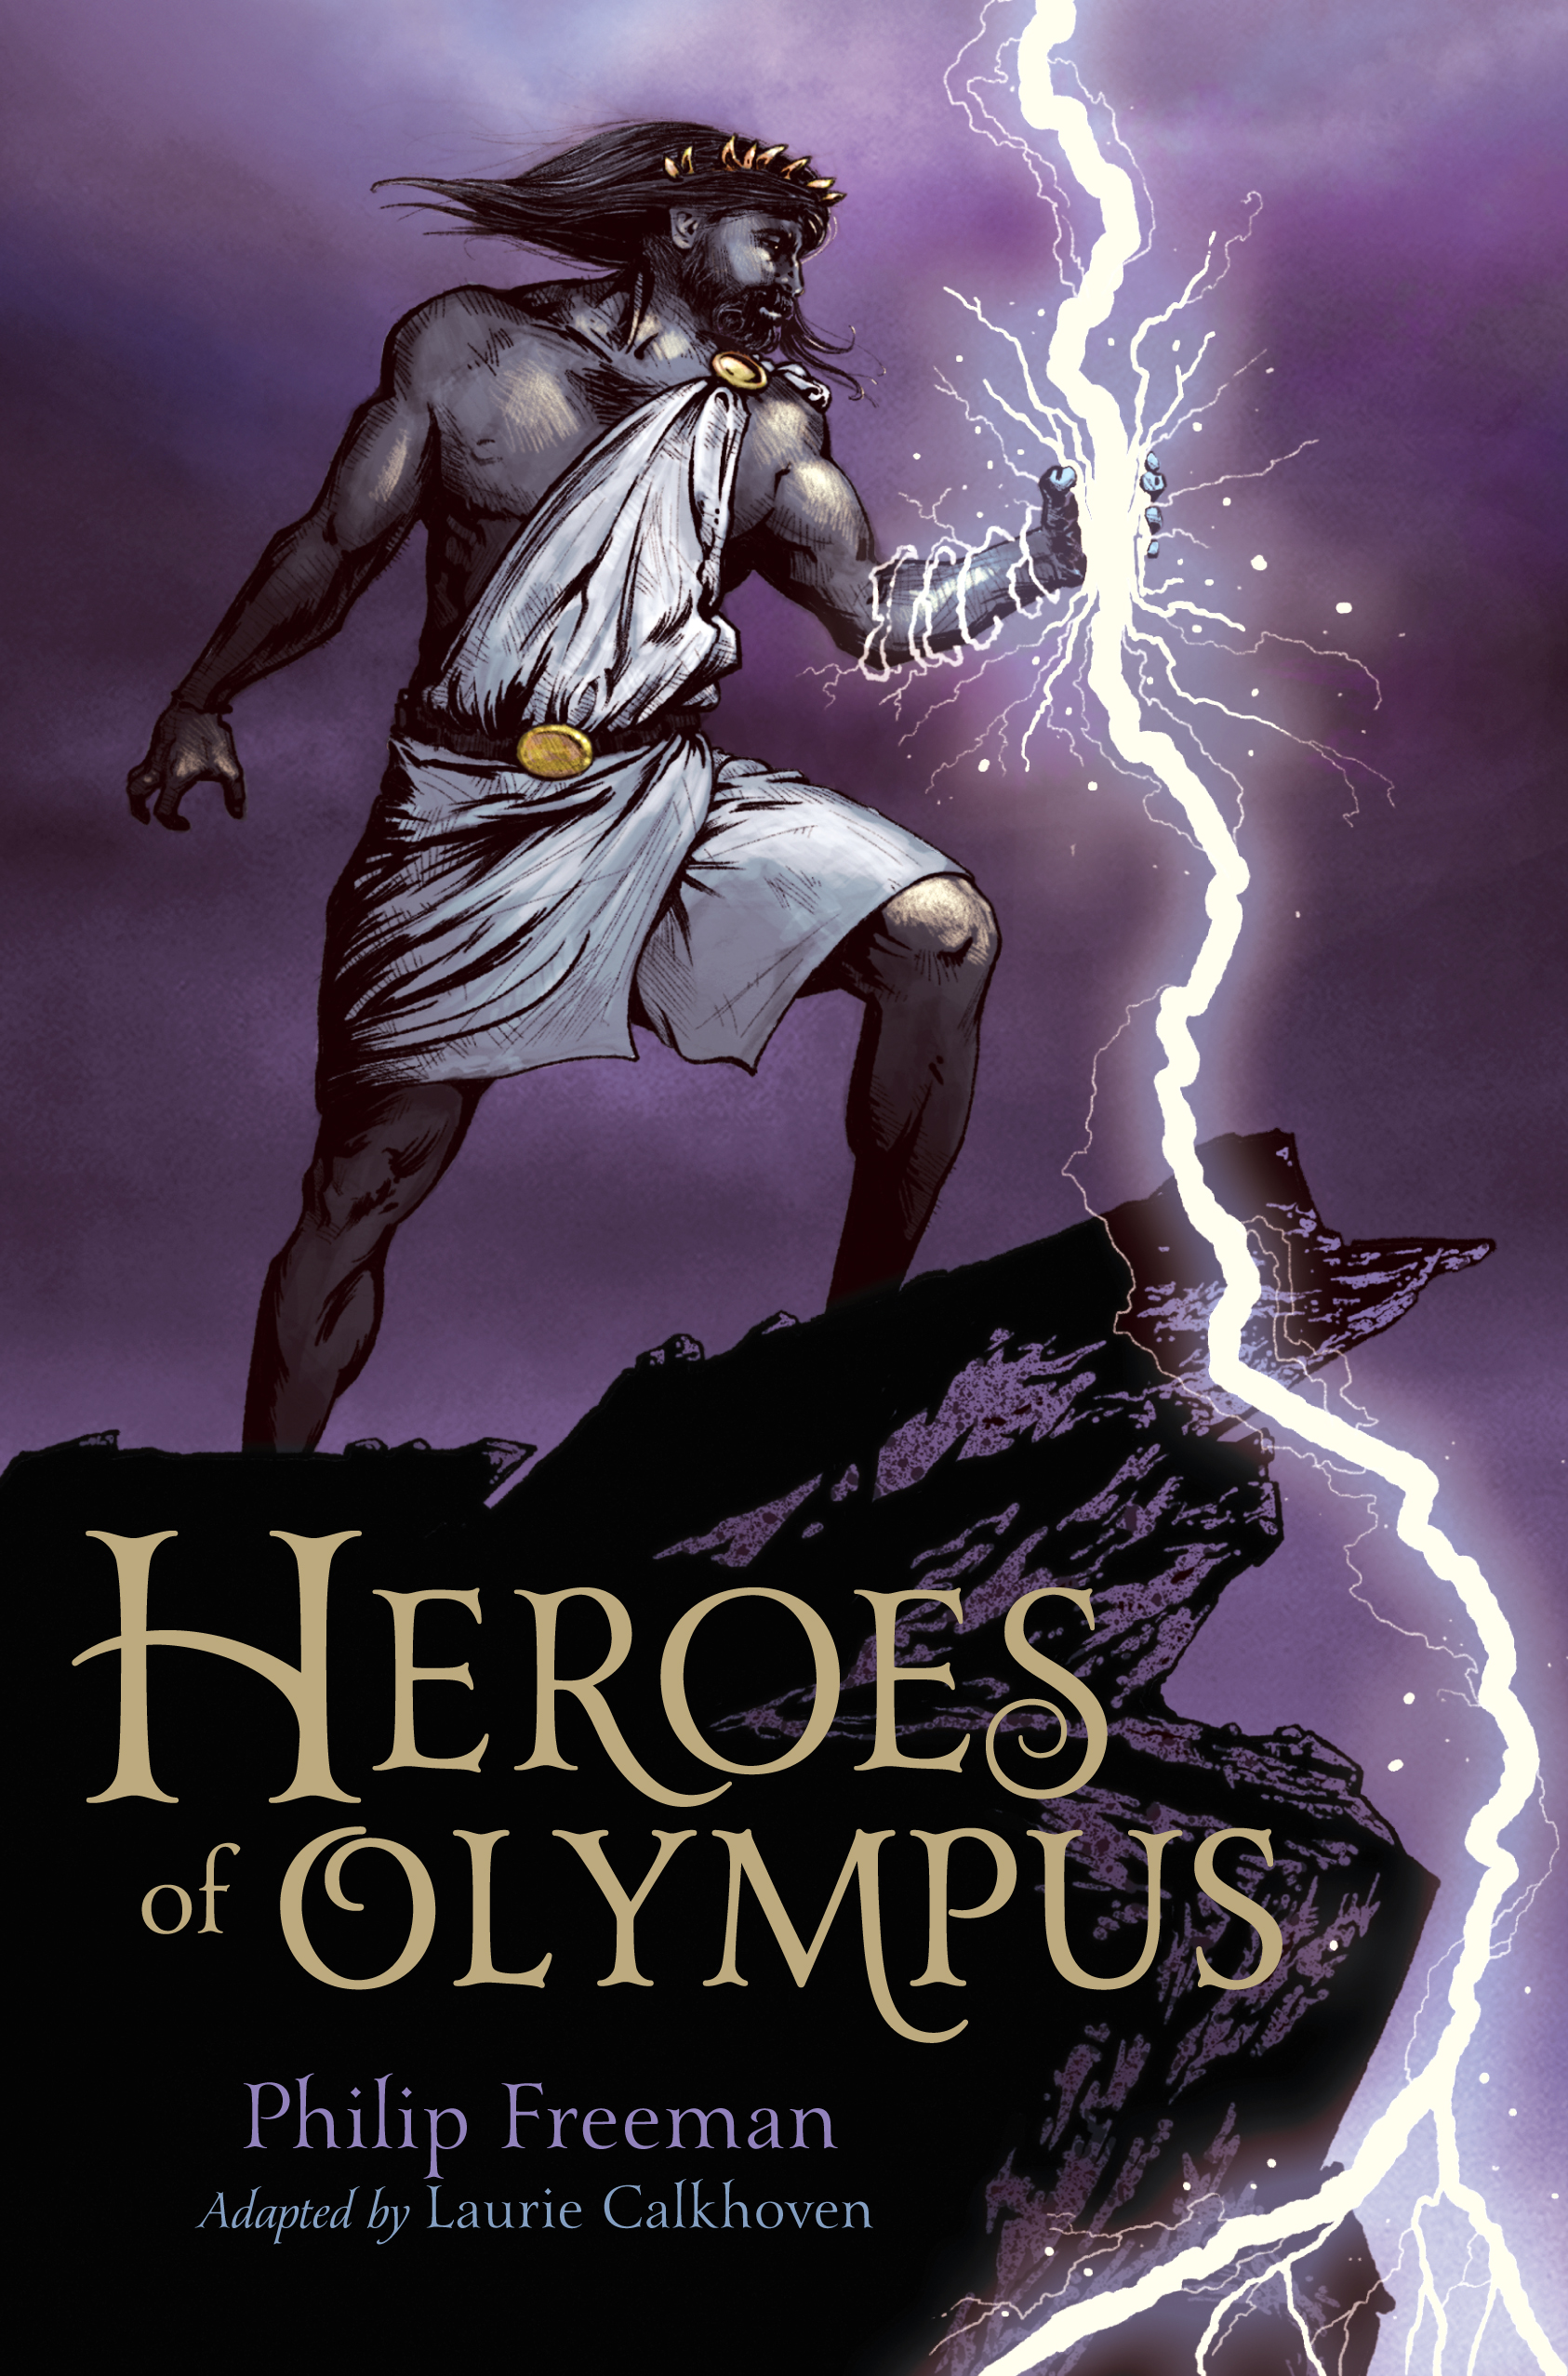 mythology fiction for 6th graders